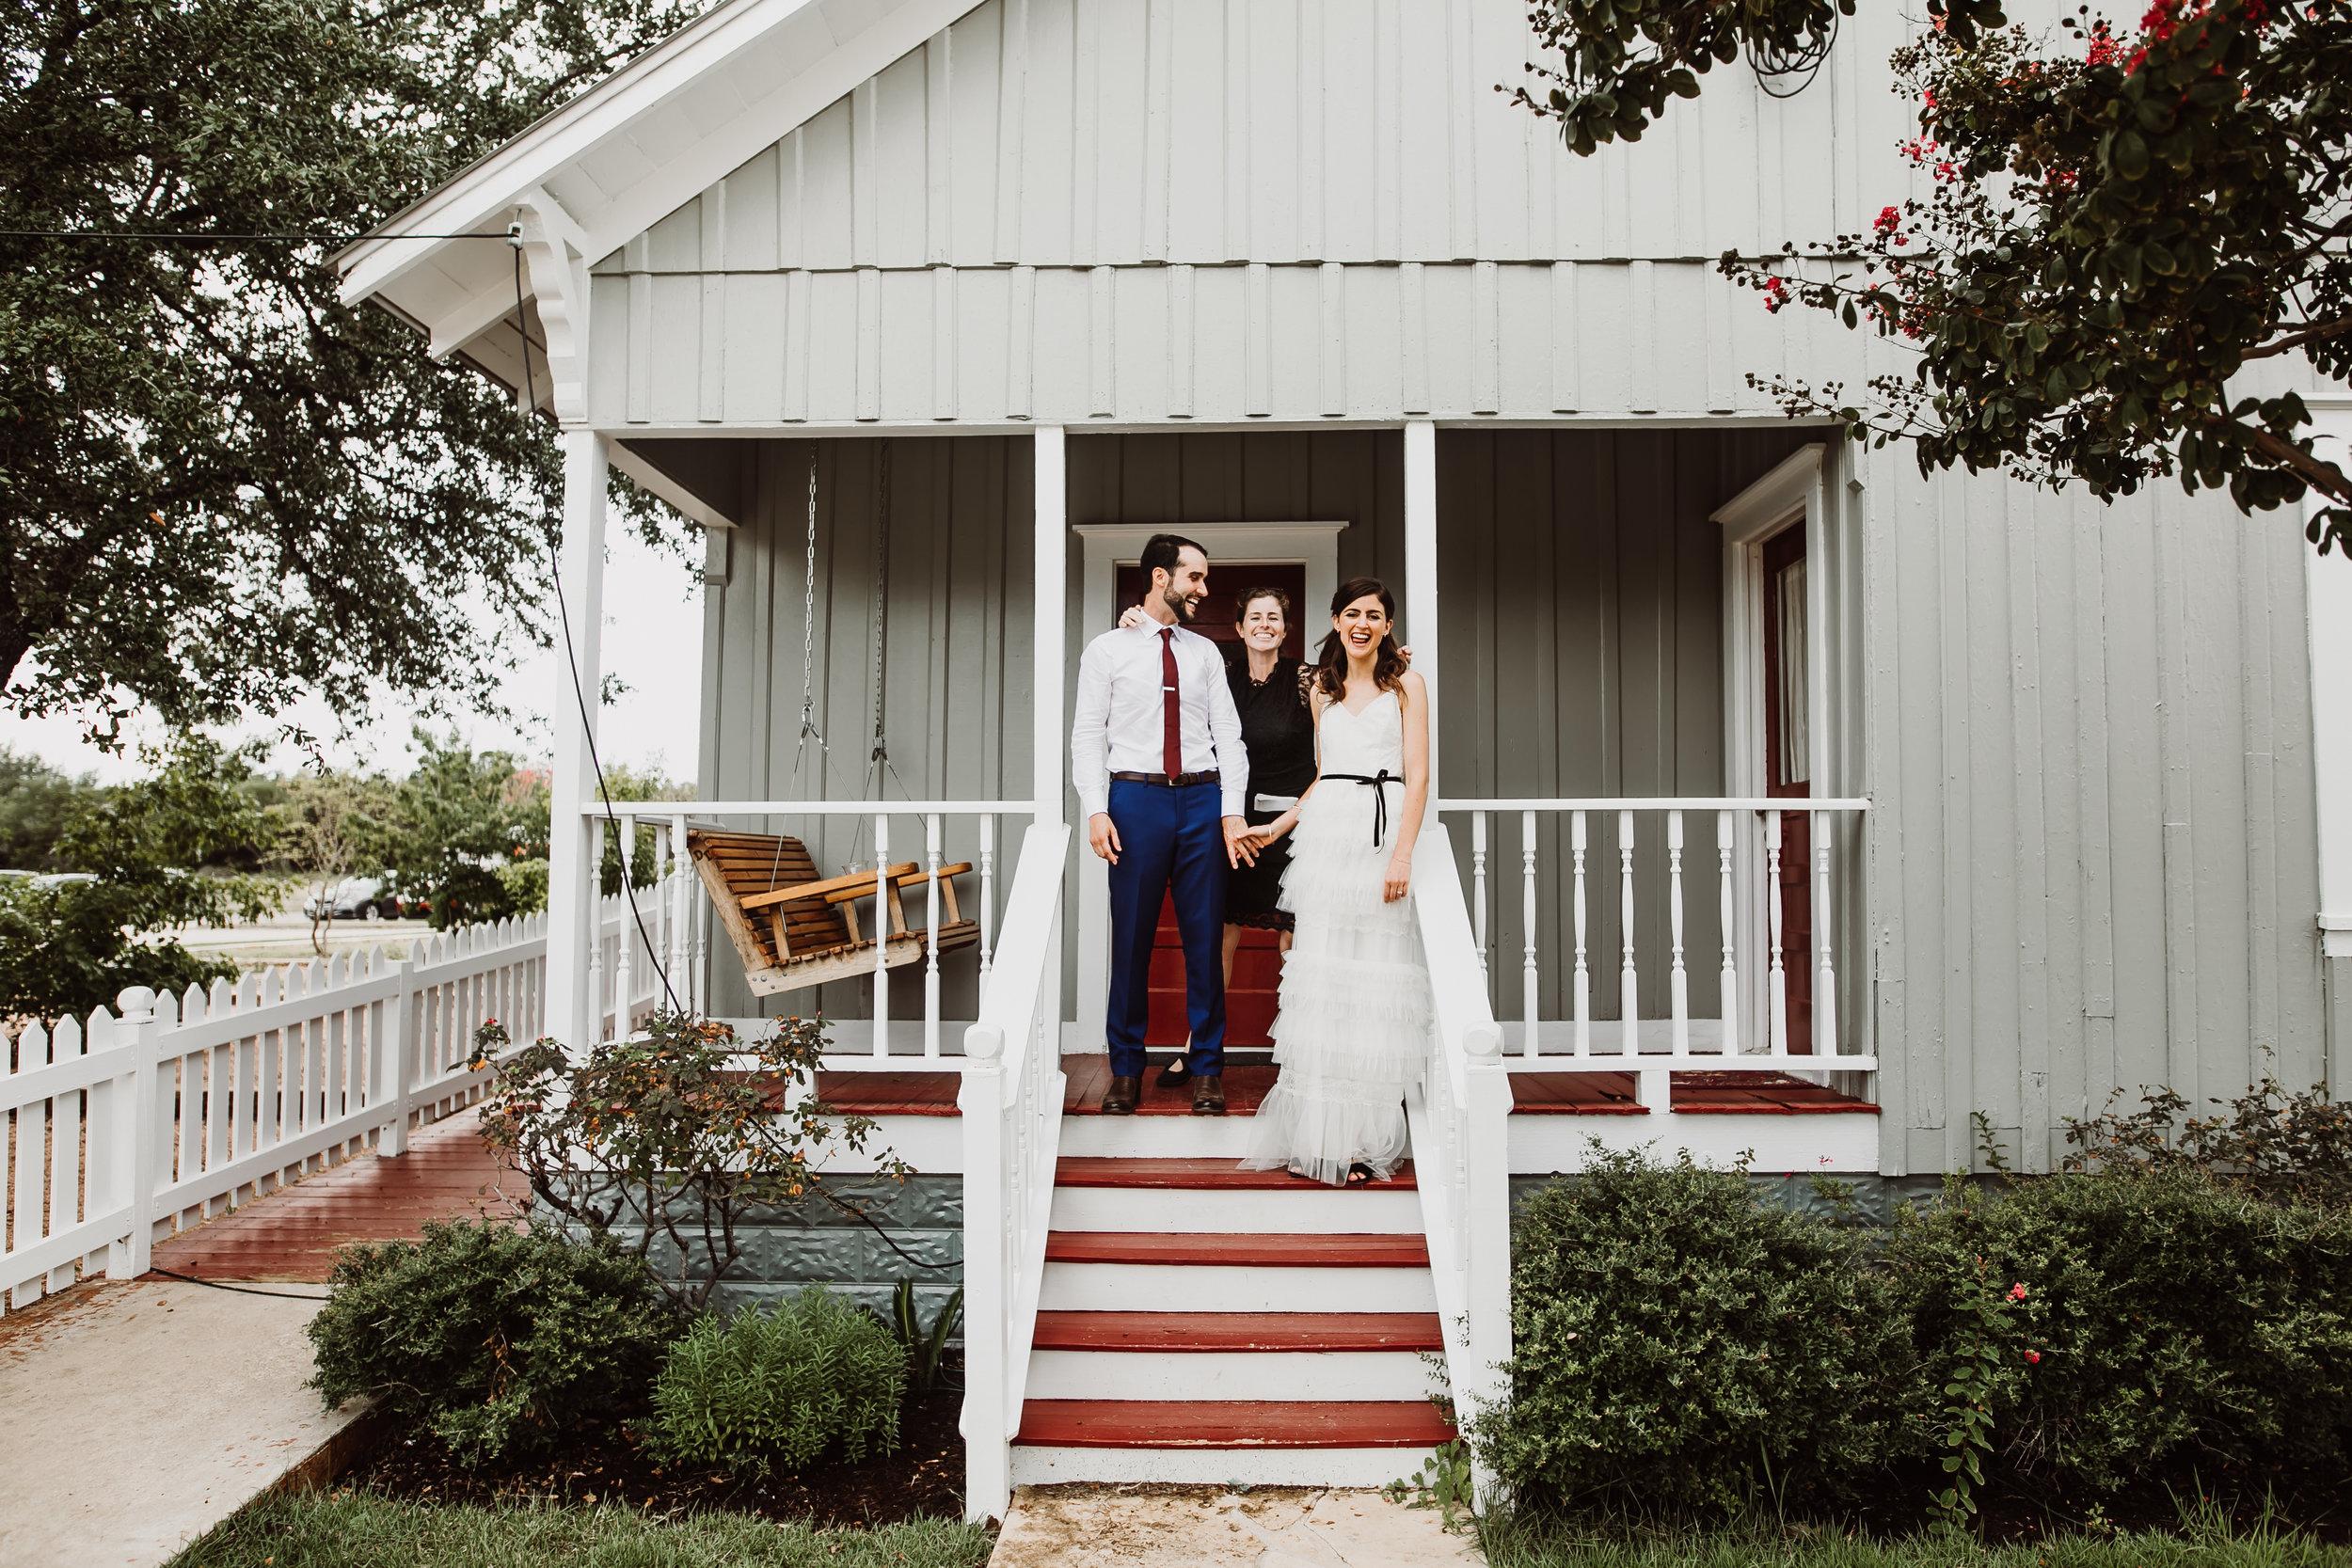 star-hill-ranch-wedding-JN (342 of 997).jpg